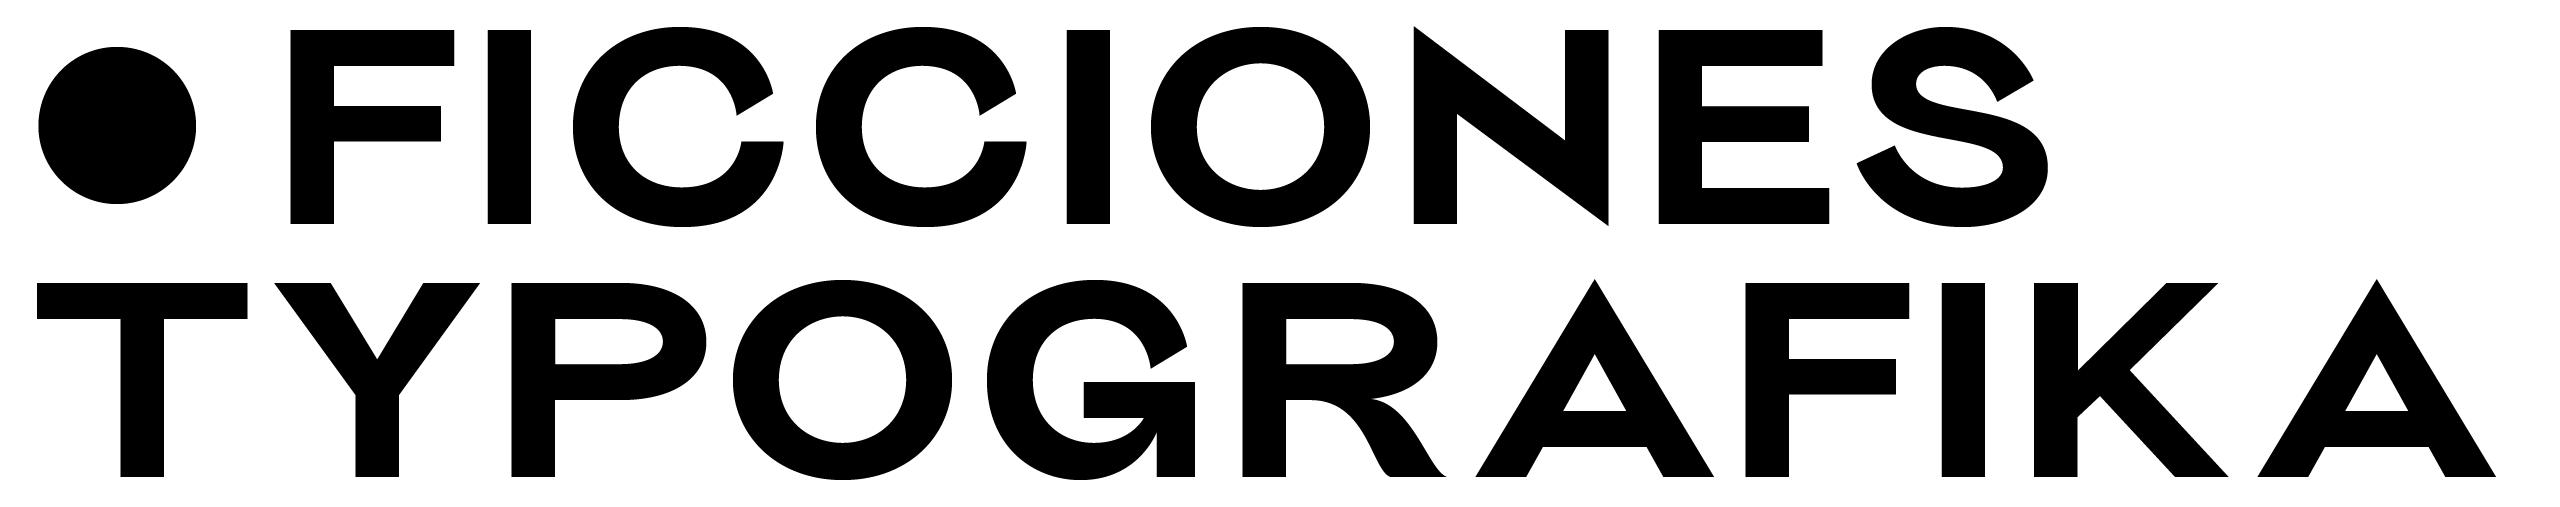 —————————Ficcionnes – – Typografika